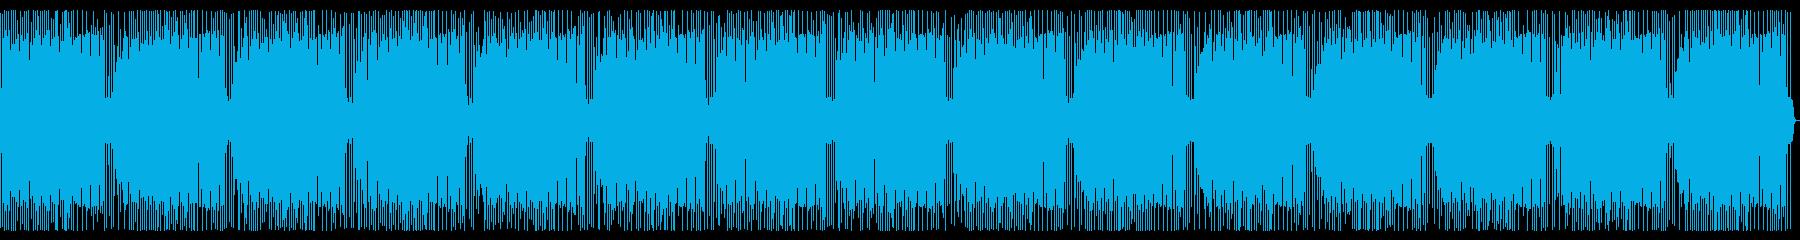 Dream Cafe ♡ Soft Jazz 15 minutes ♡'s reproduced waveform